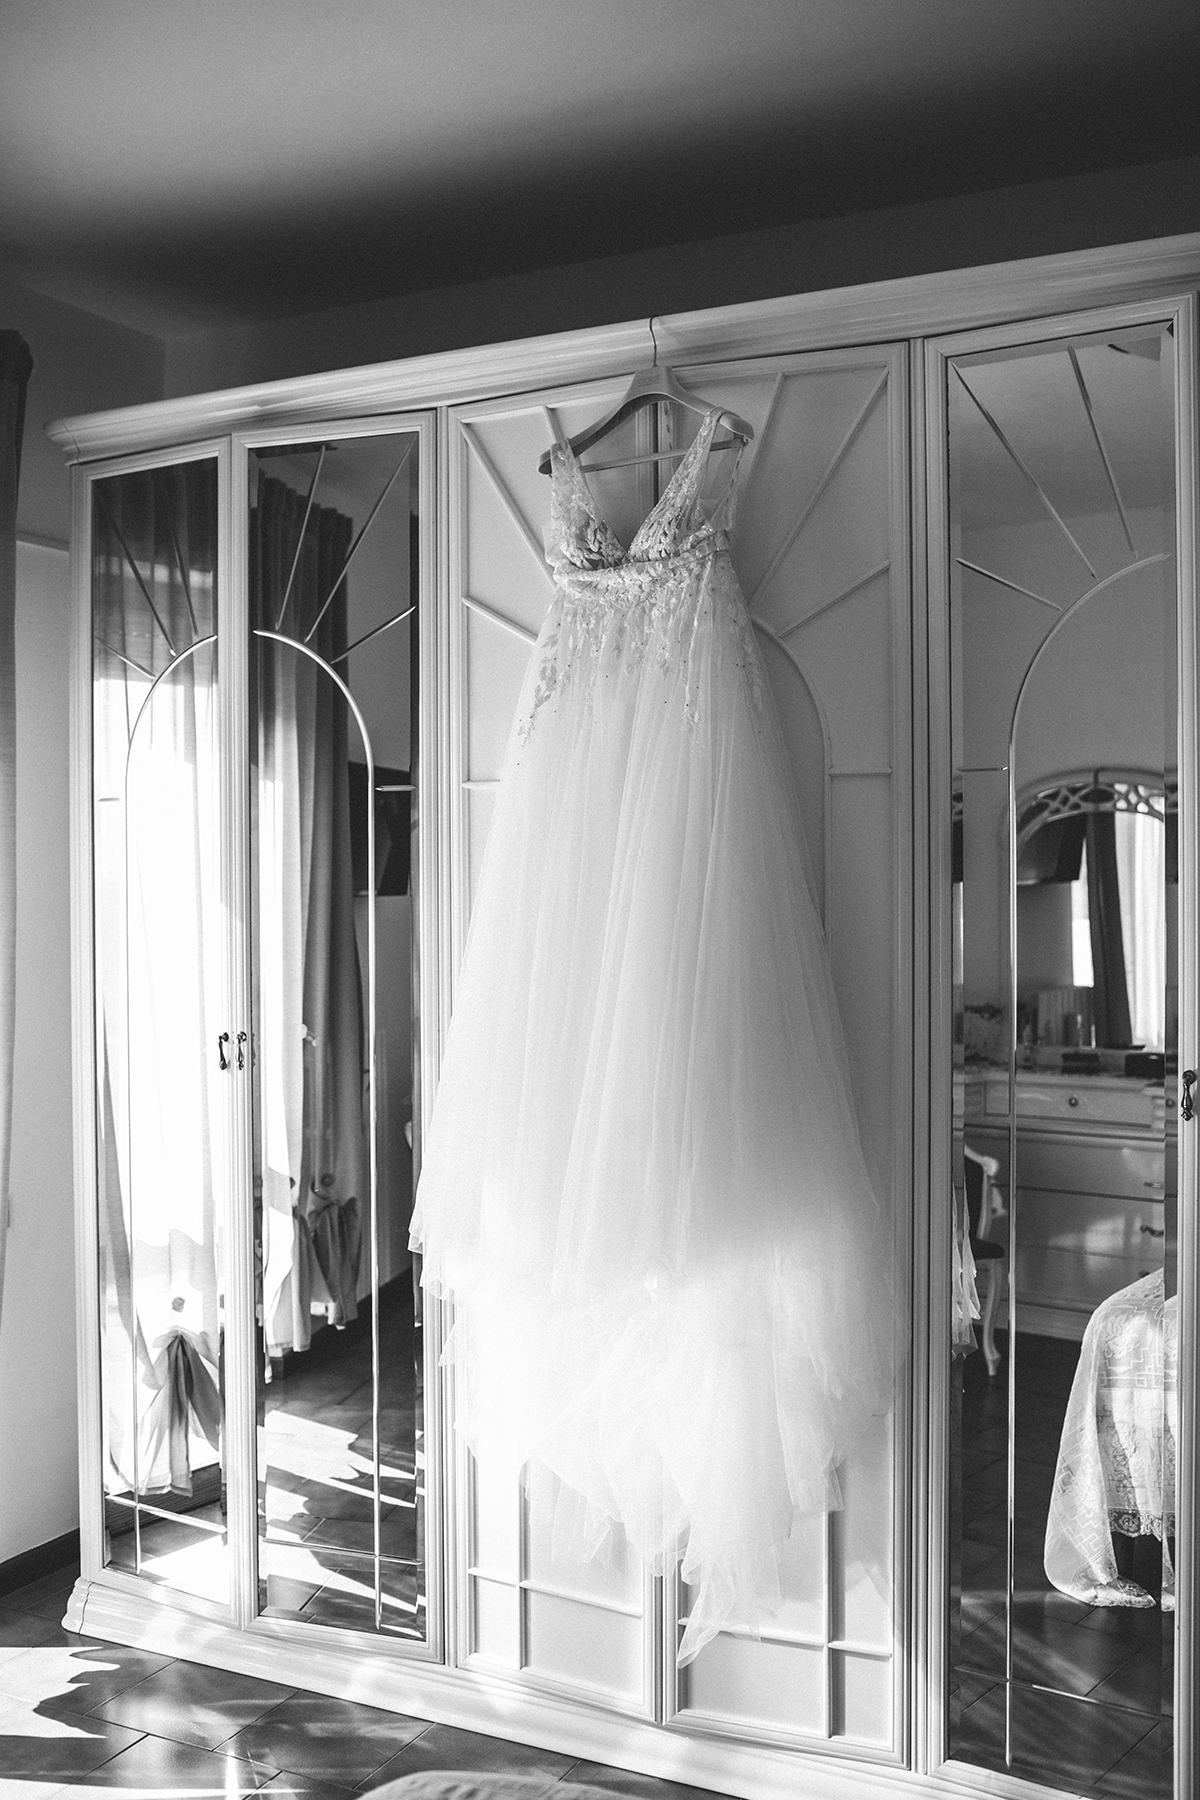 The bride's dress